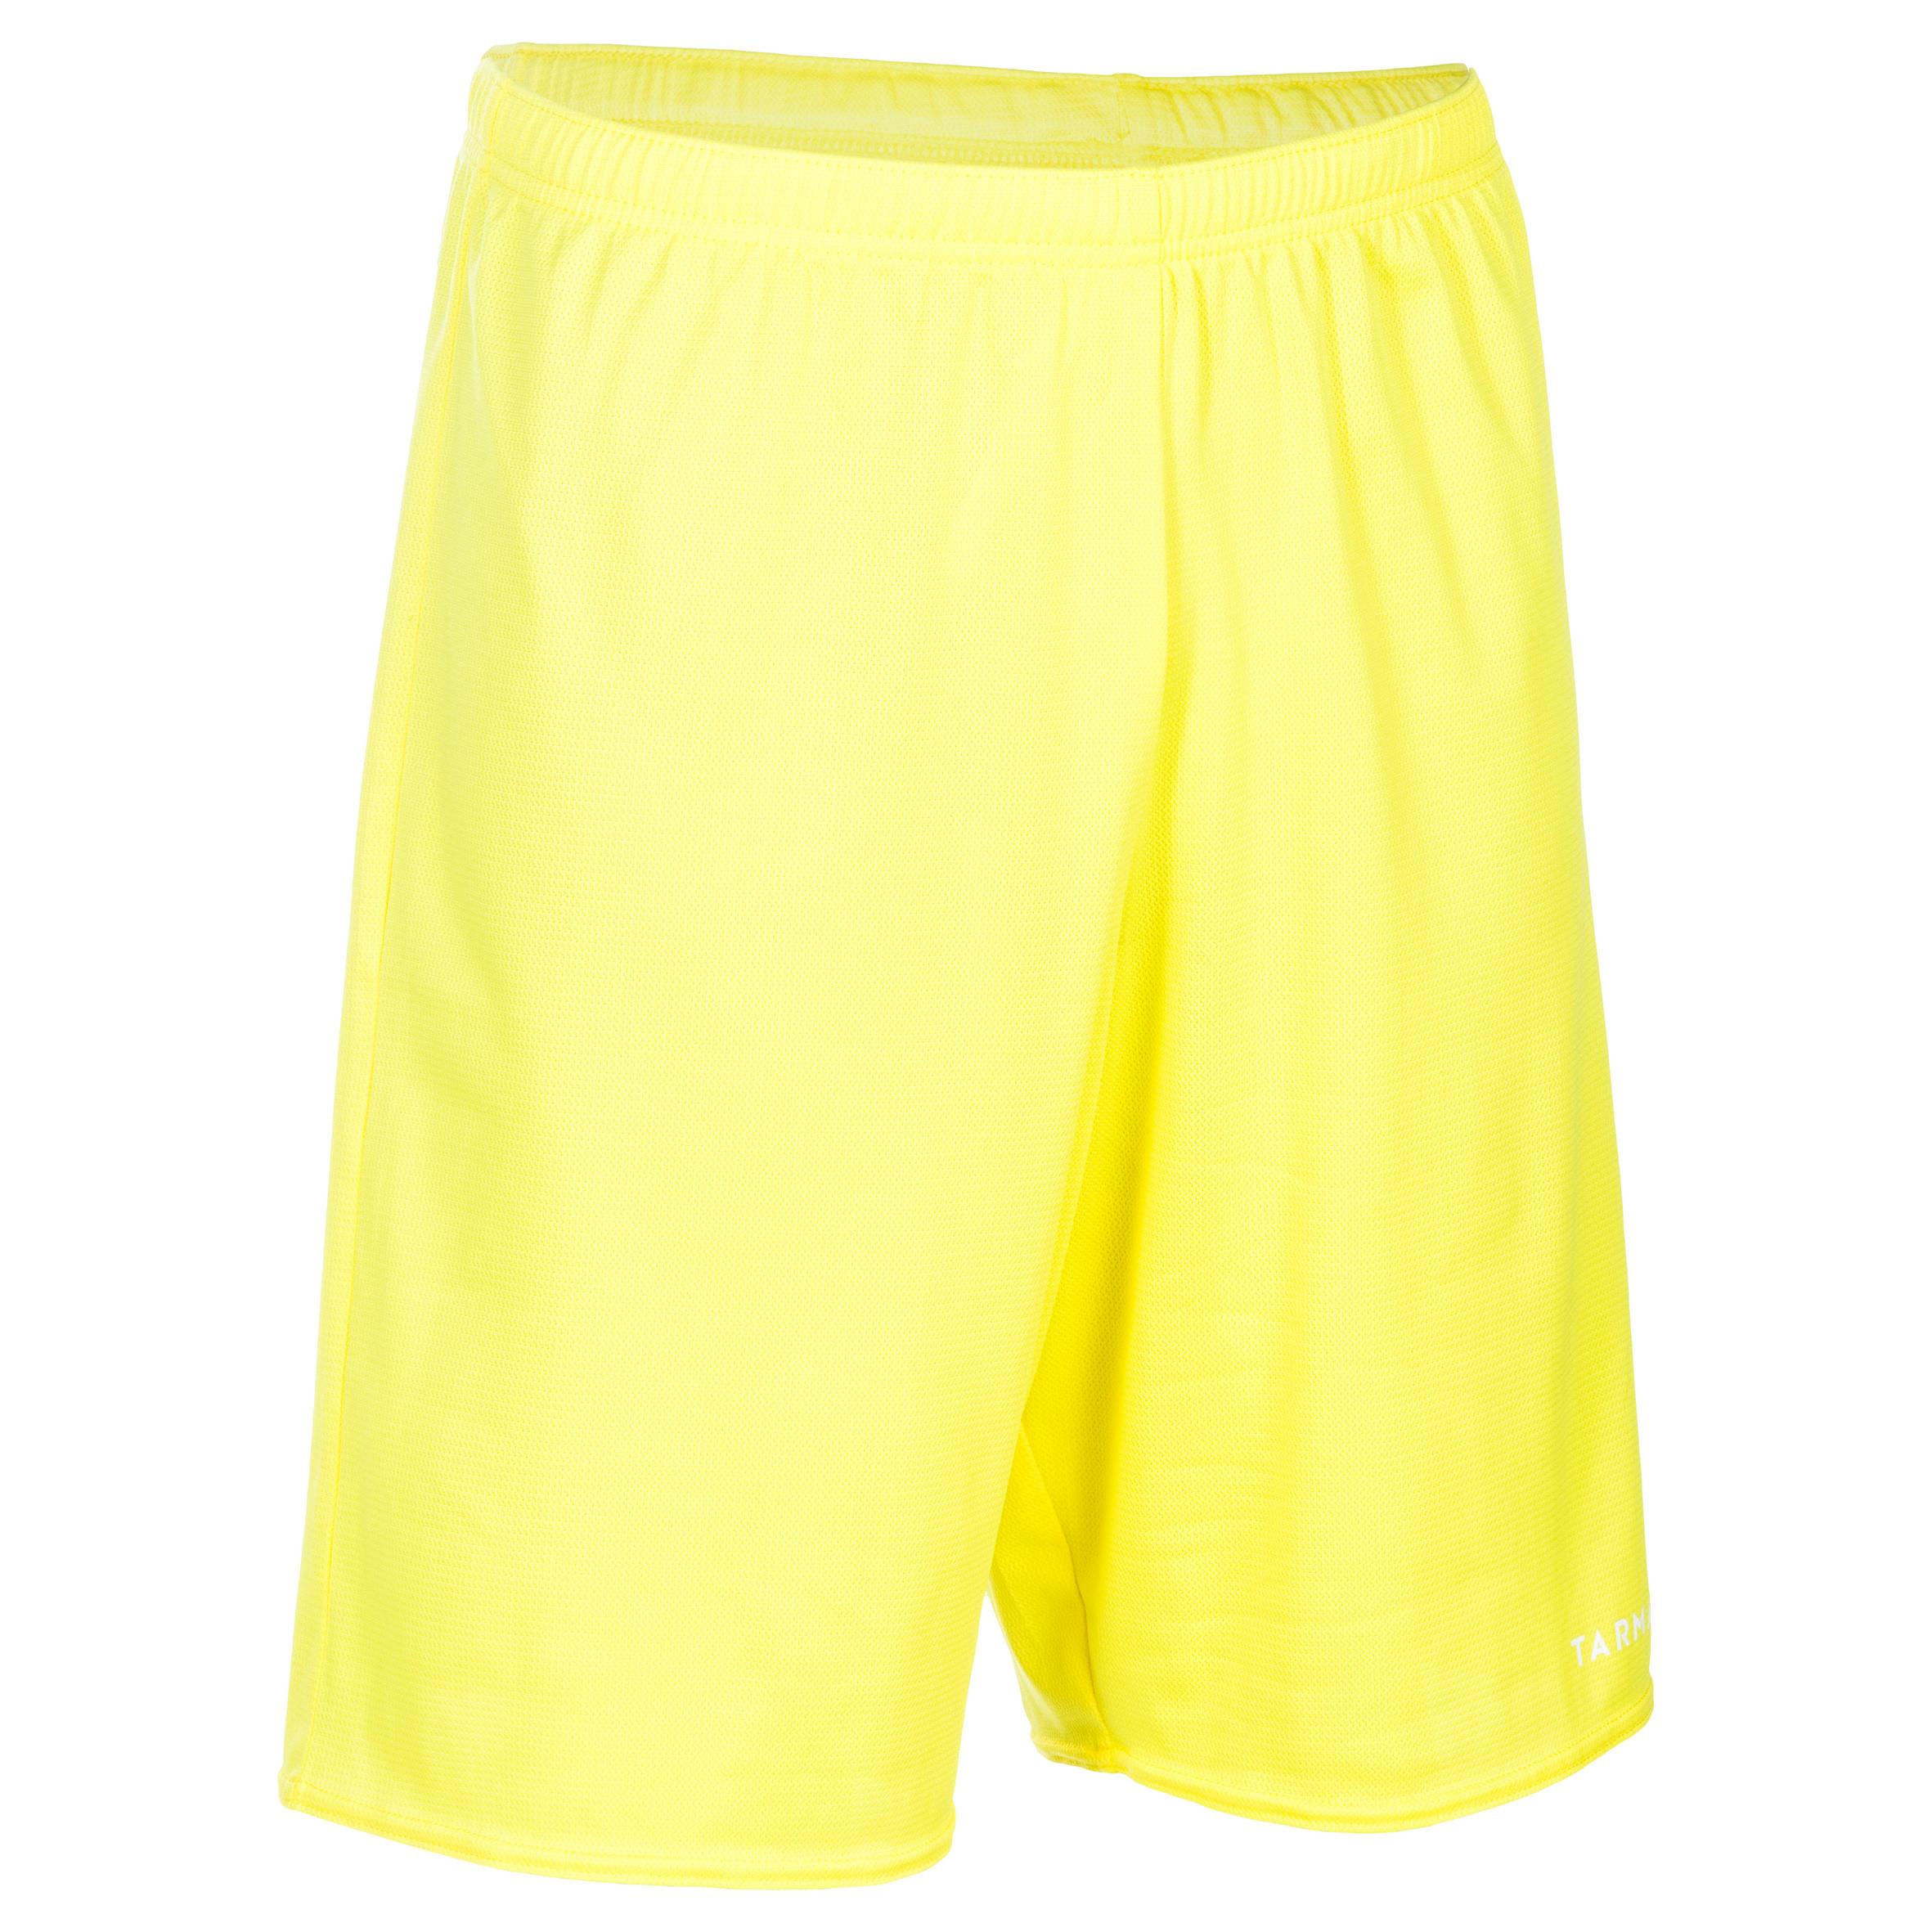 Tarmak Basketbalshort SH100 geel